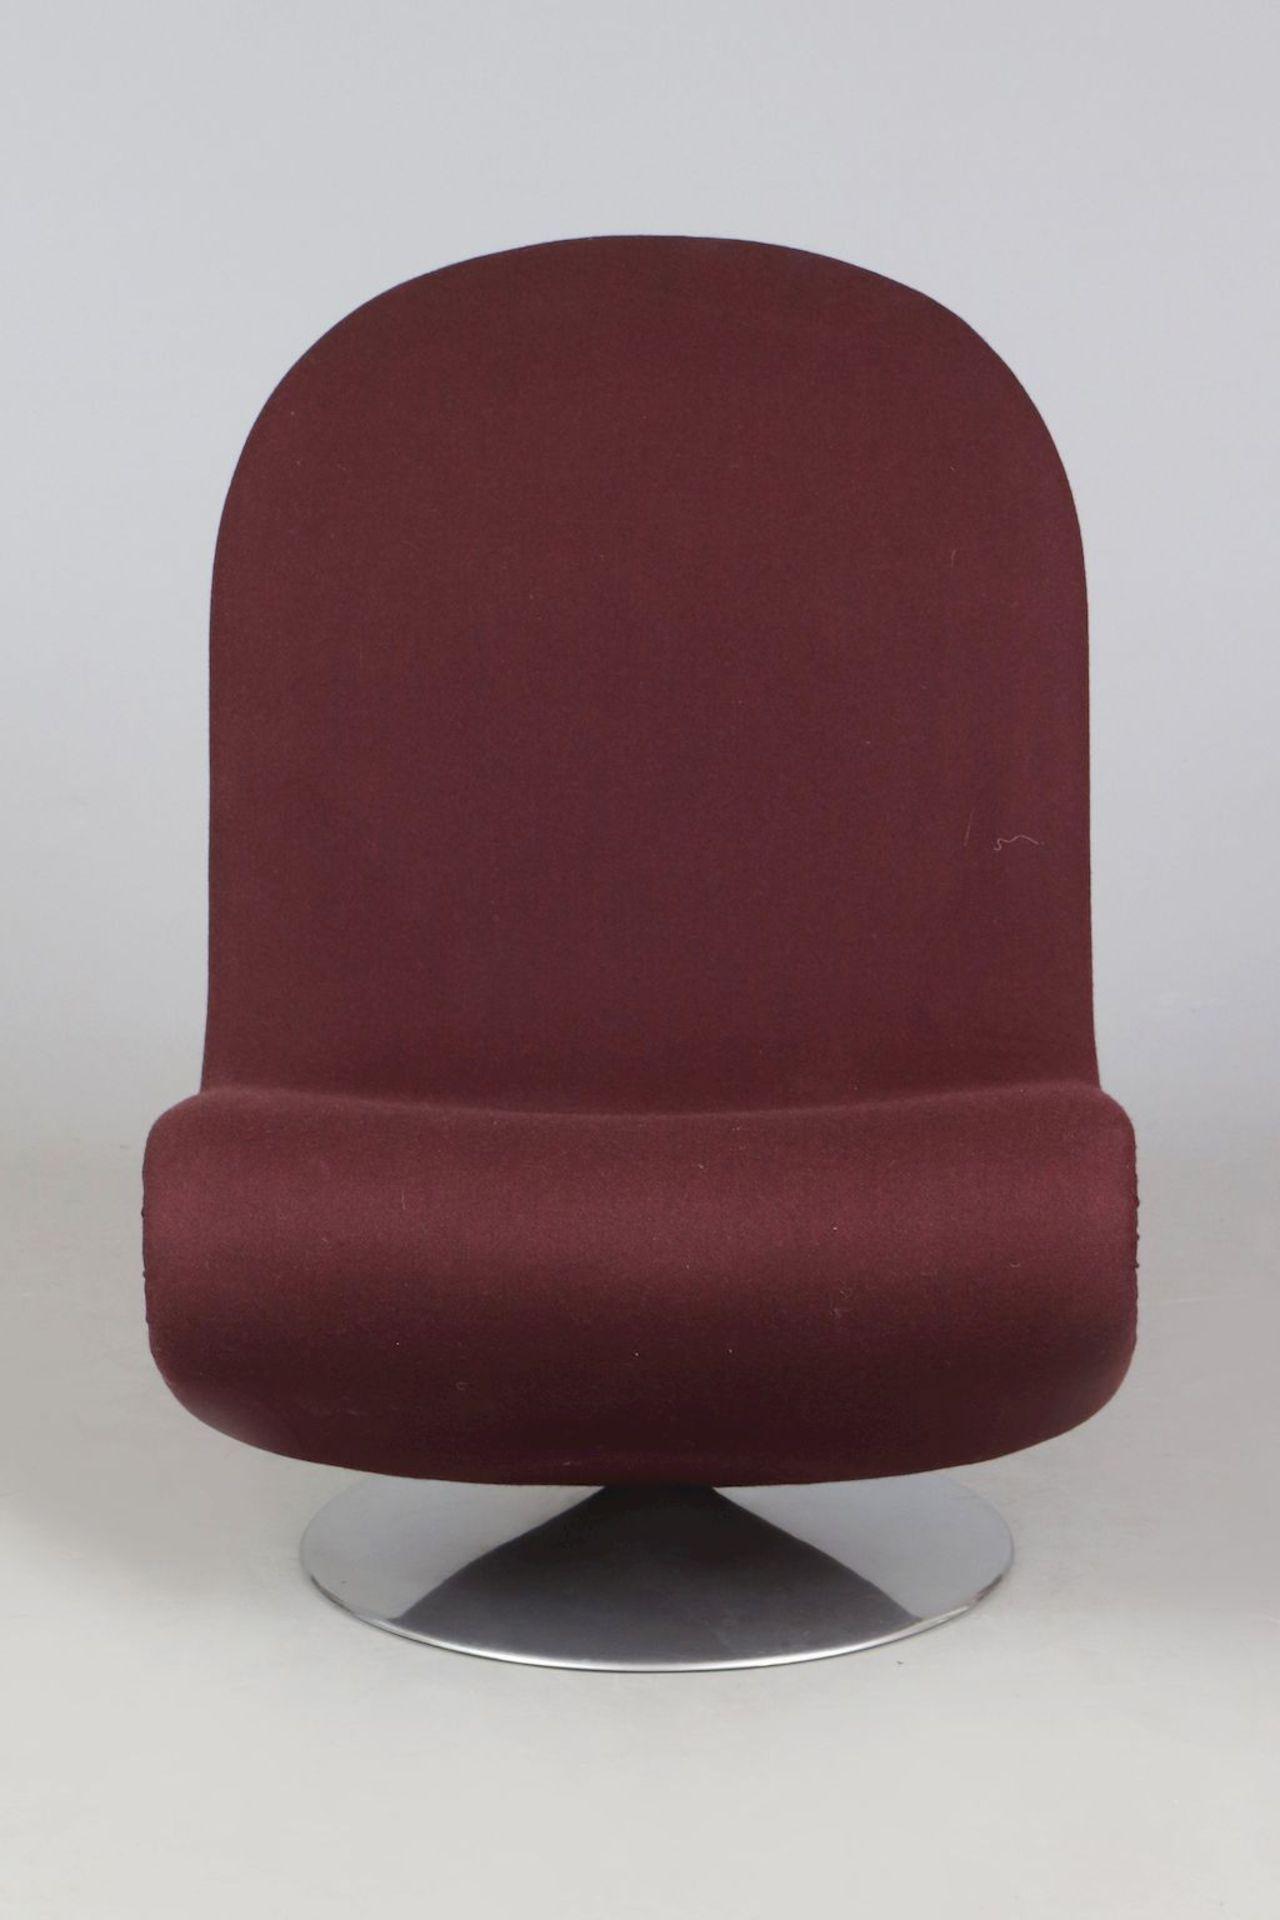 VERNER PANTON 1-2-3 Lounge Chair - Image 2 of 4